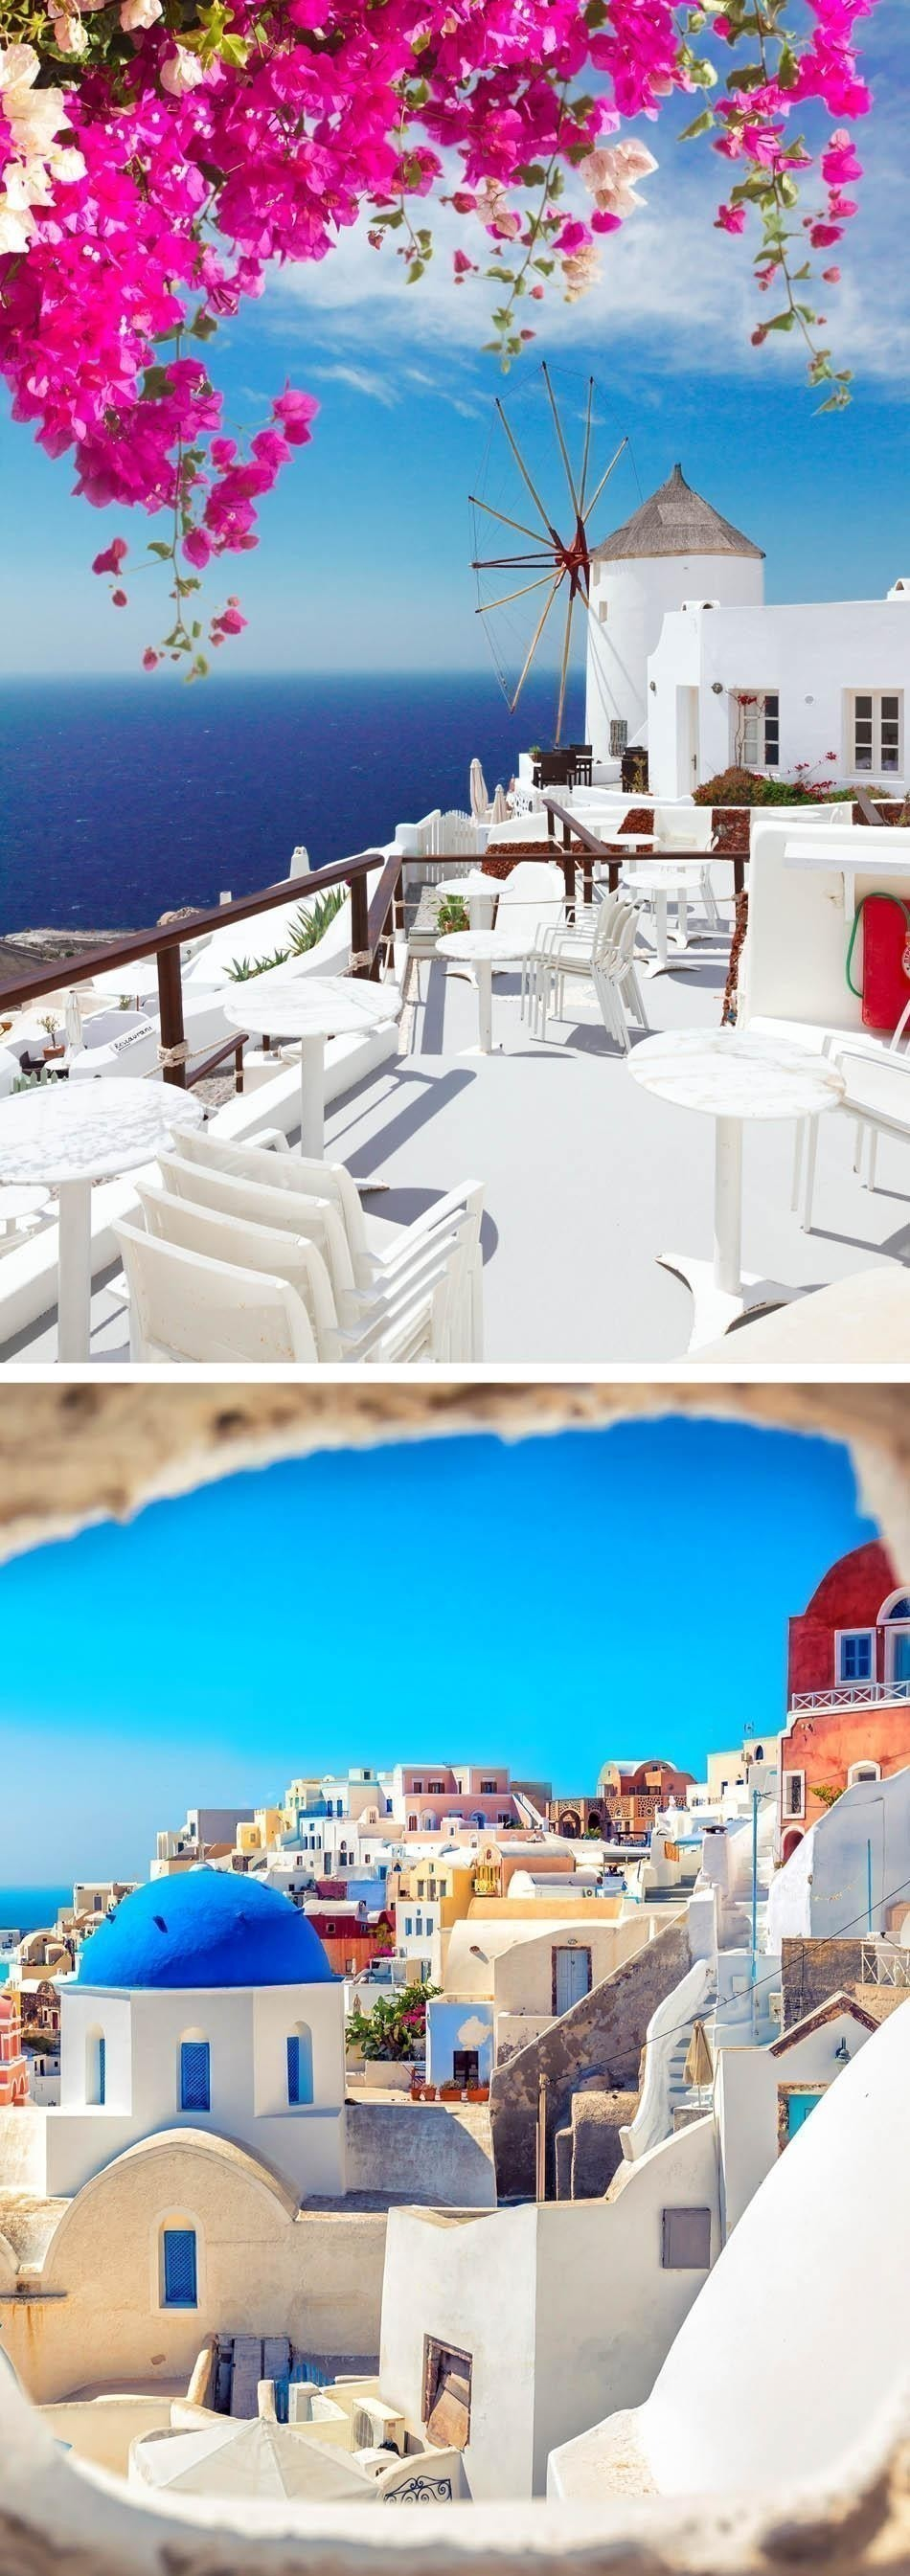 Beautiful Santorini, Greece | Top 10 most beautiful islands in the world